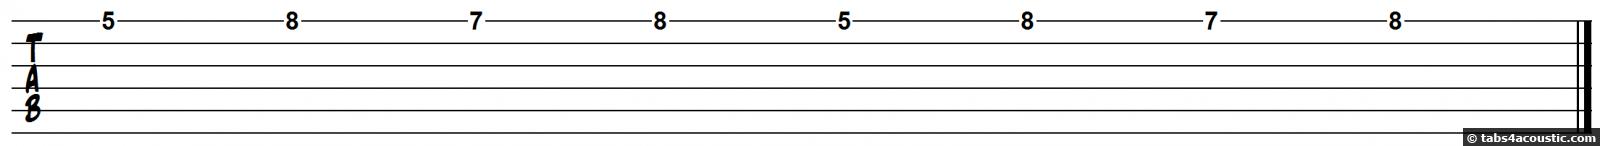 Deuxième exercice, variation 2